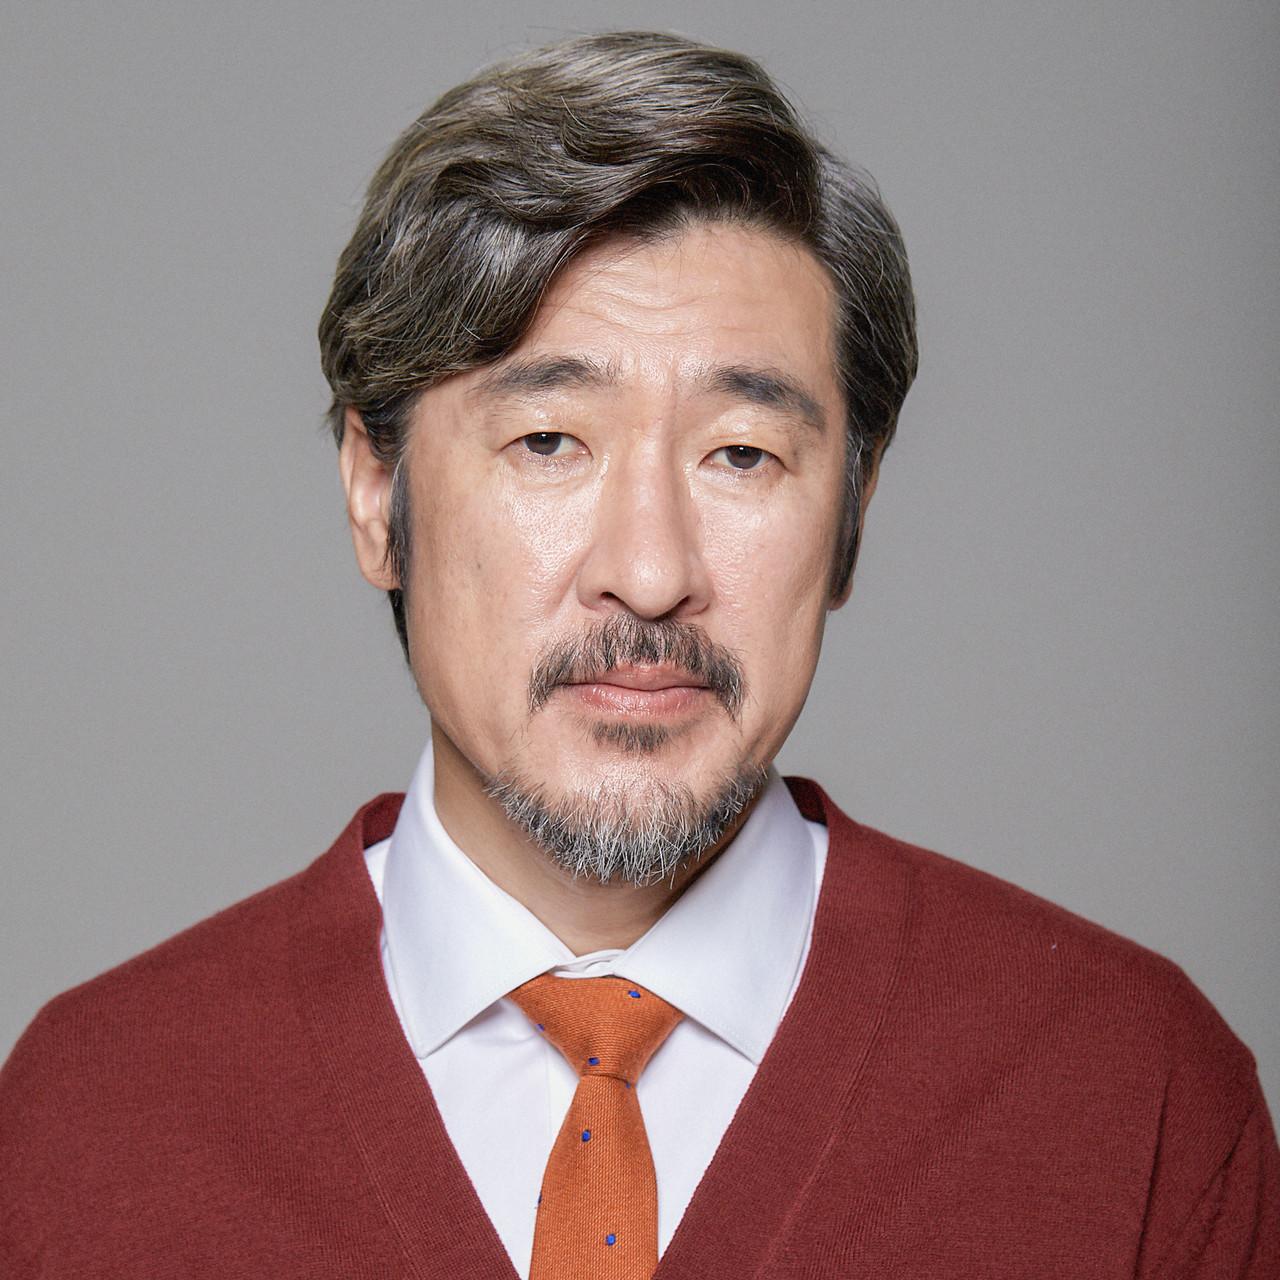 <b>하성광<br>Ha Sung Kwang</b>